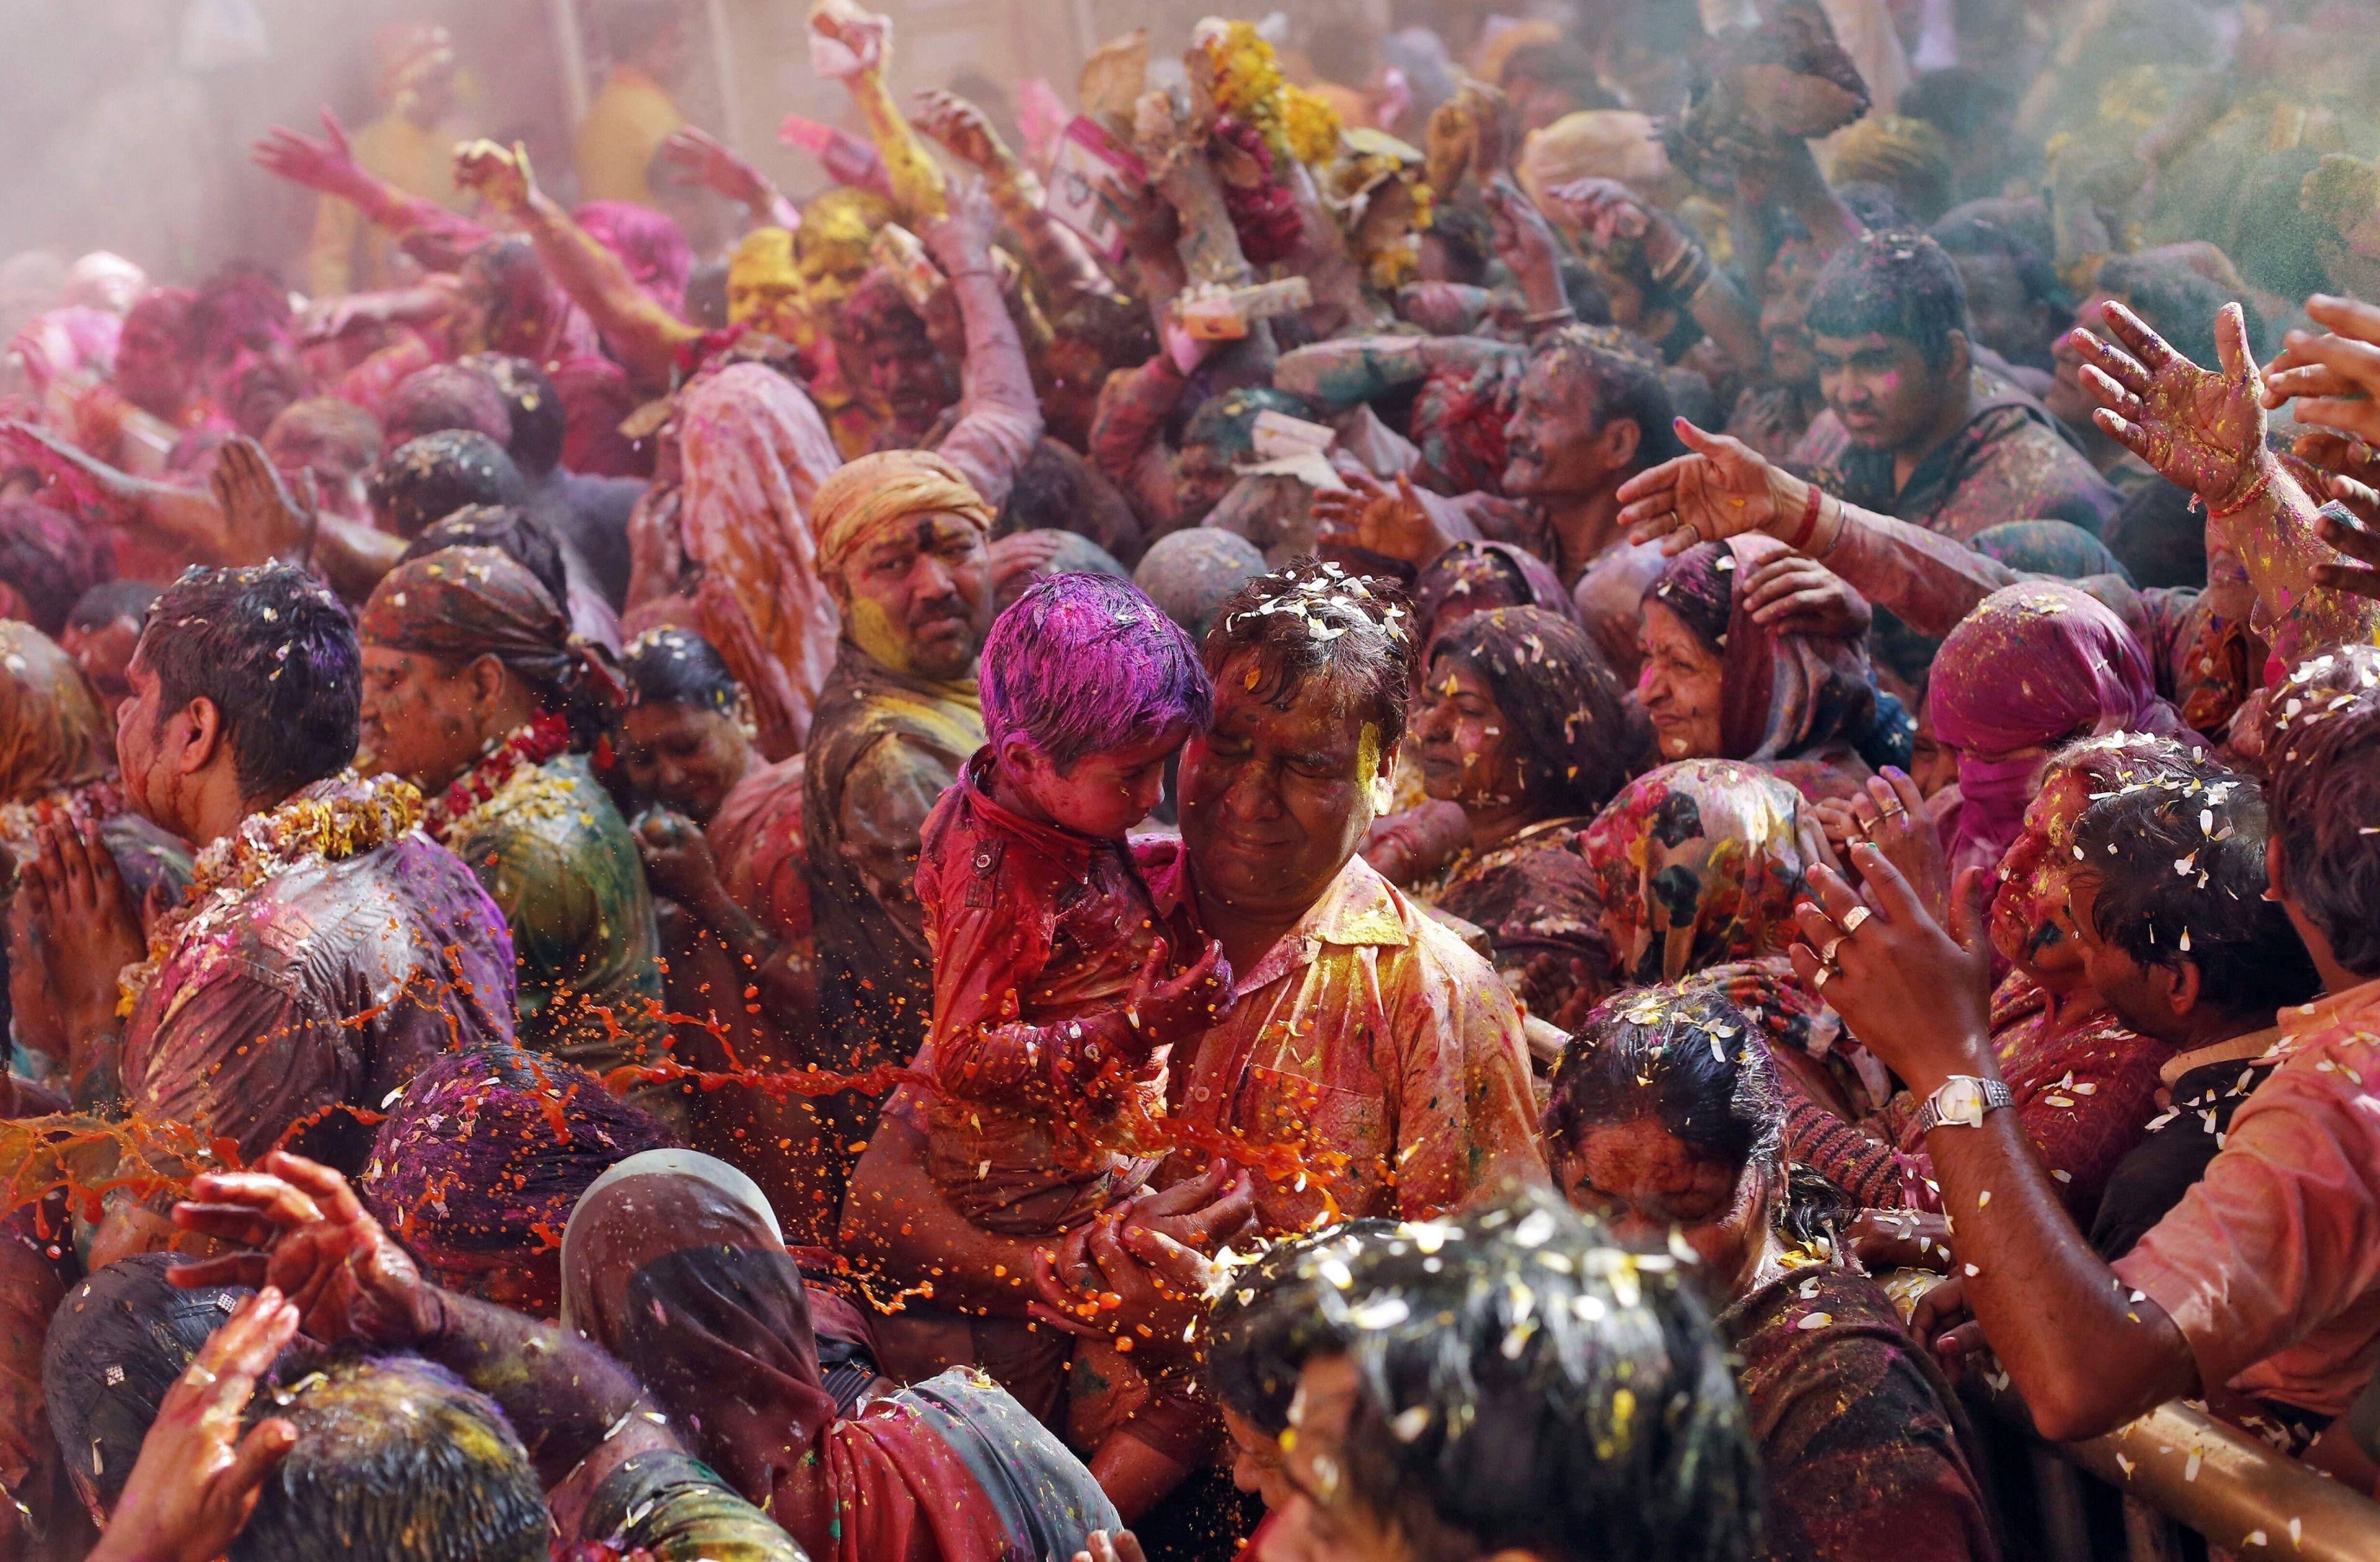 3840x2520 Holi Festival Of Colours 4k Hd Wallpaper Holi Celebration Holi Festival Of Colours Color Festival